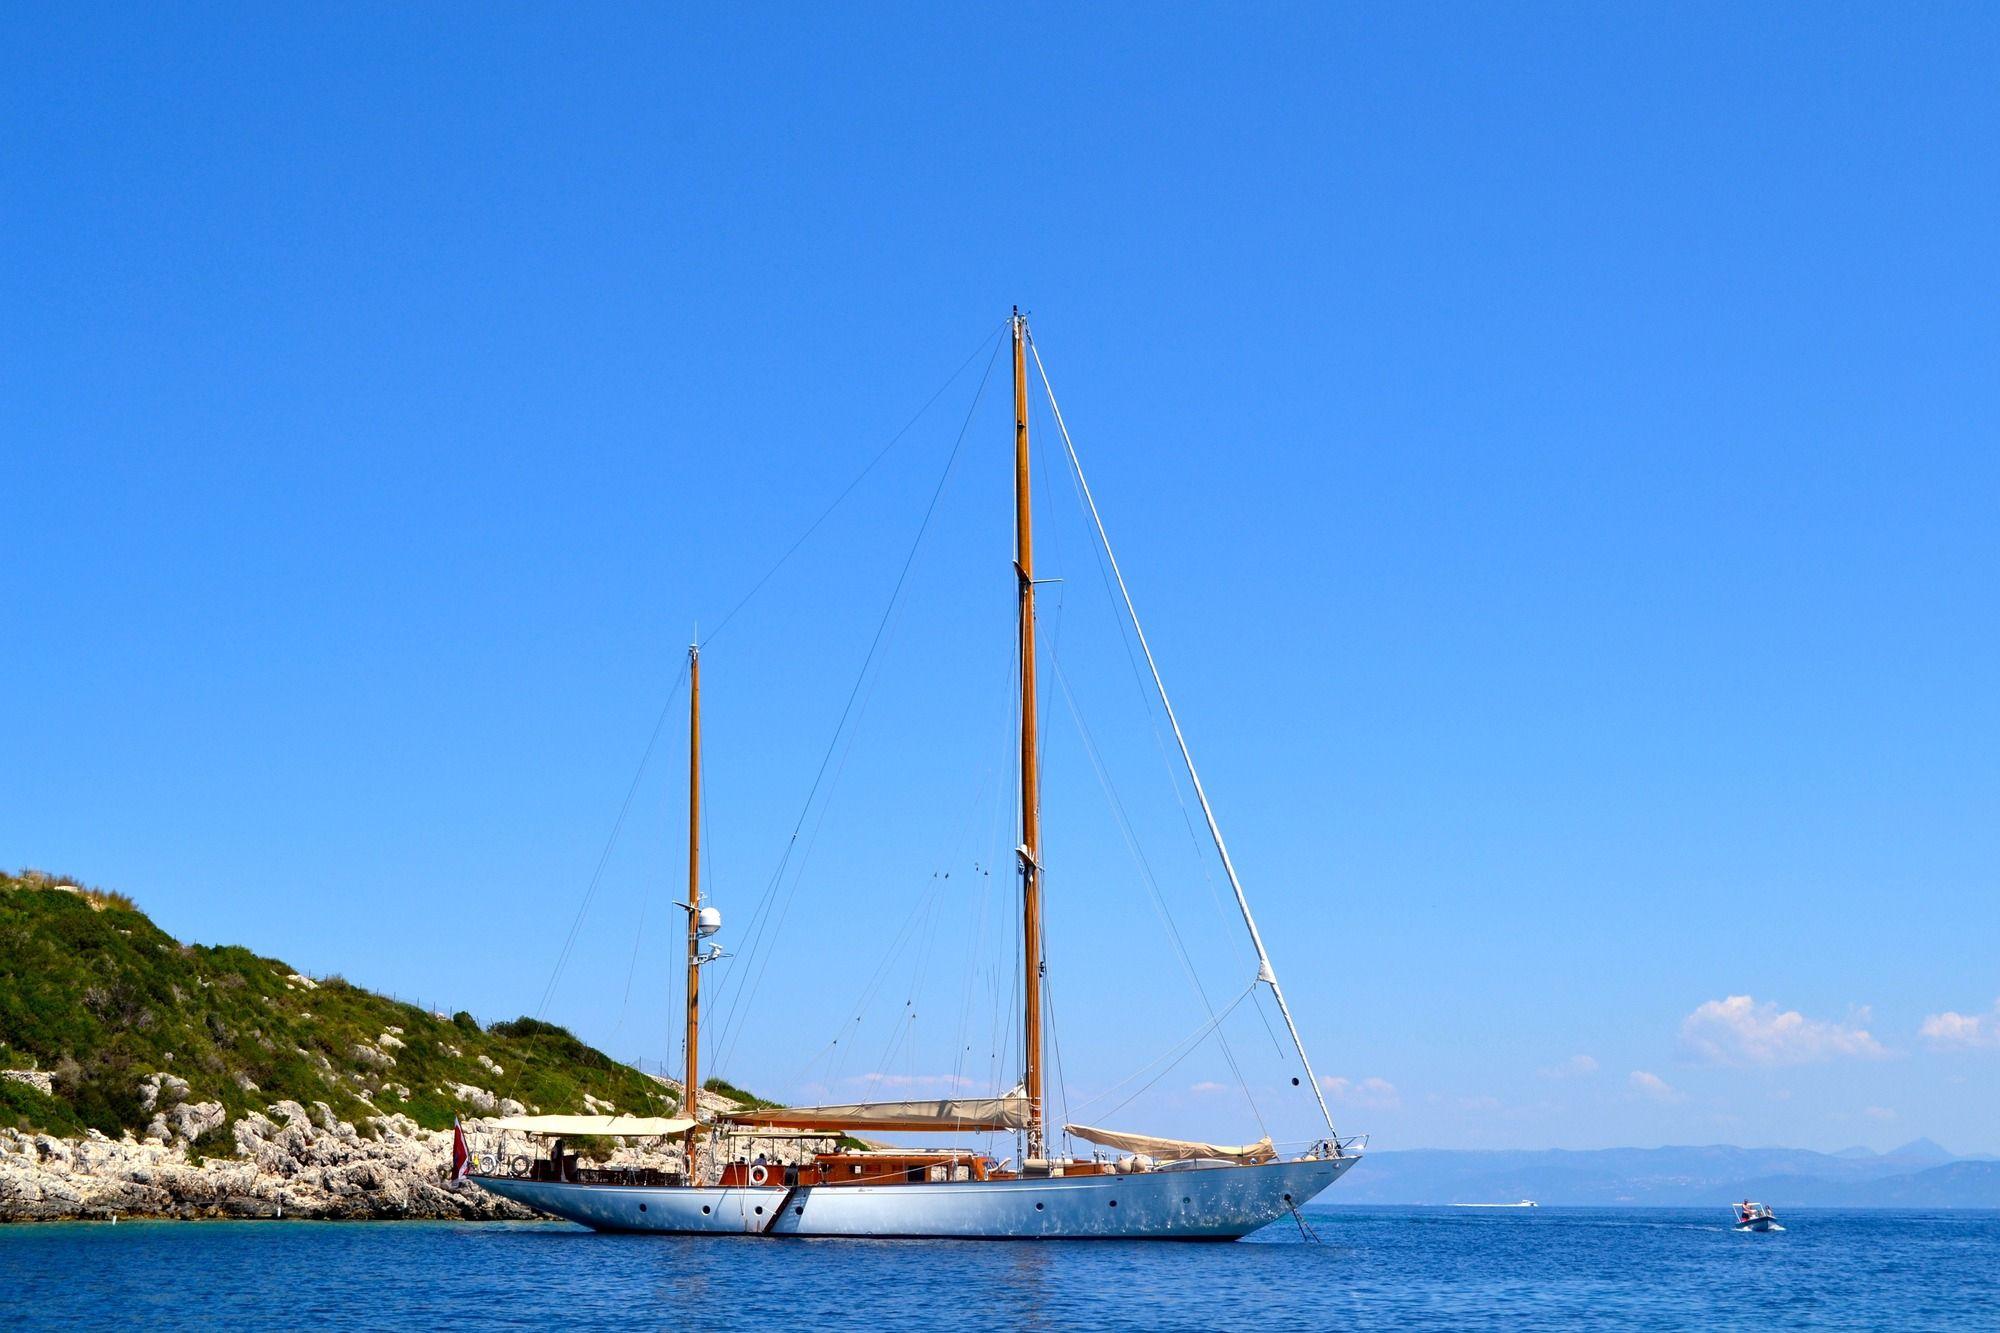 TIZIANA - Abeking & Rasmussen 116 - 5 Cabins - Spain - Ibiza - Andratx